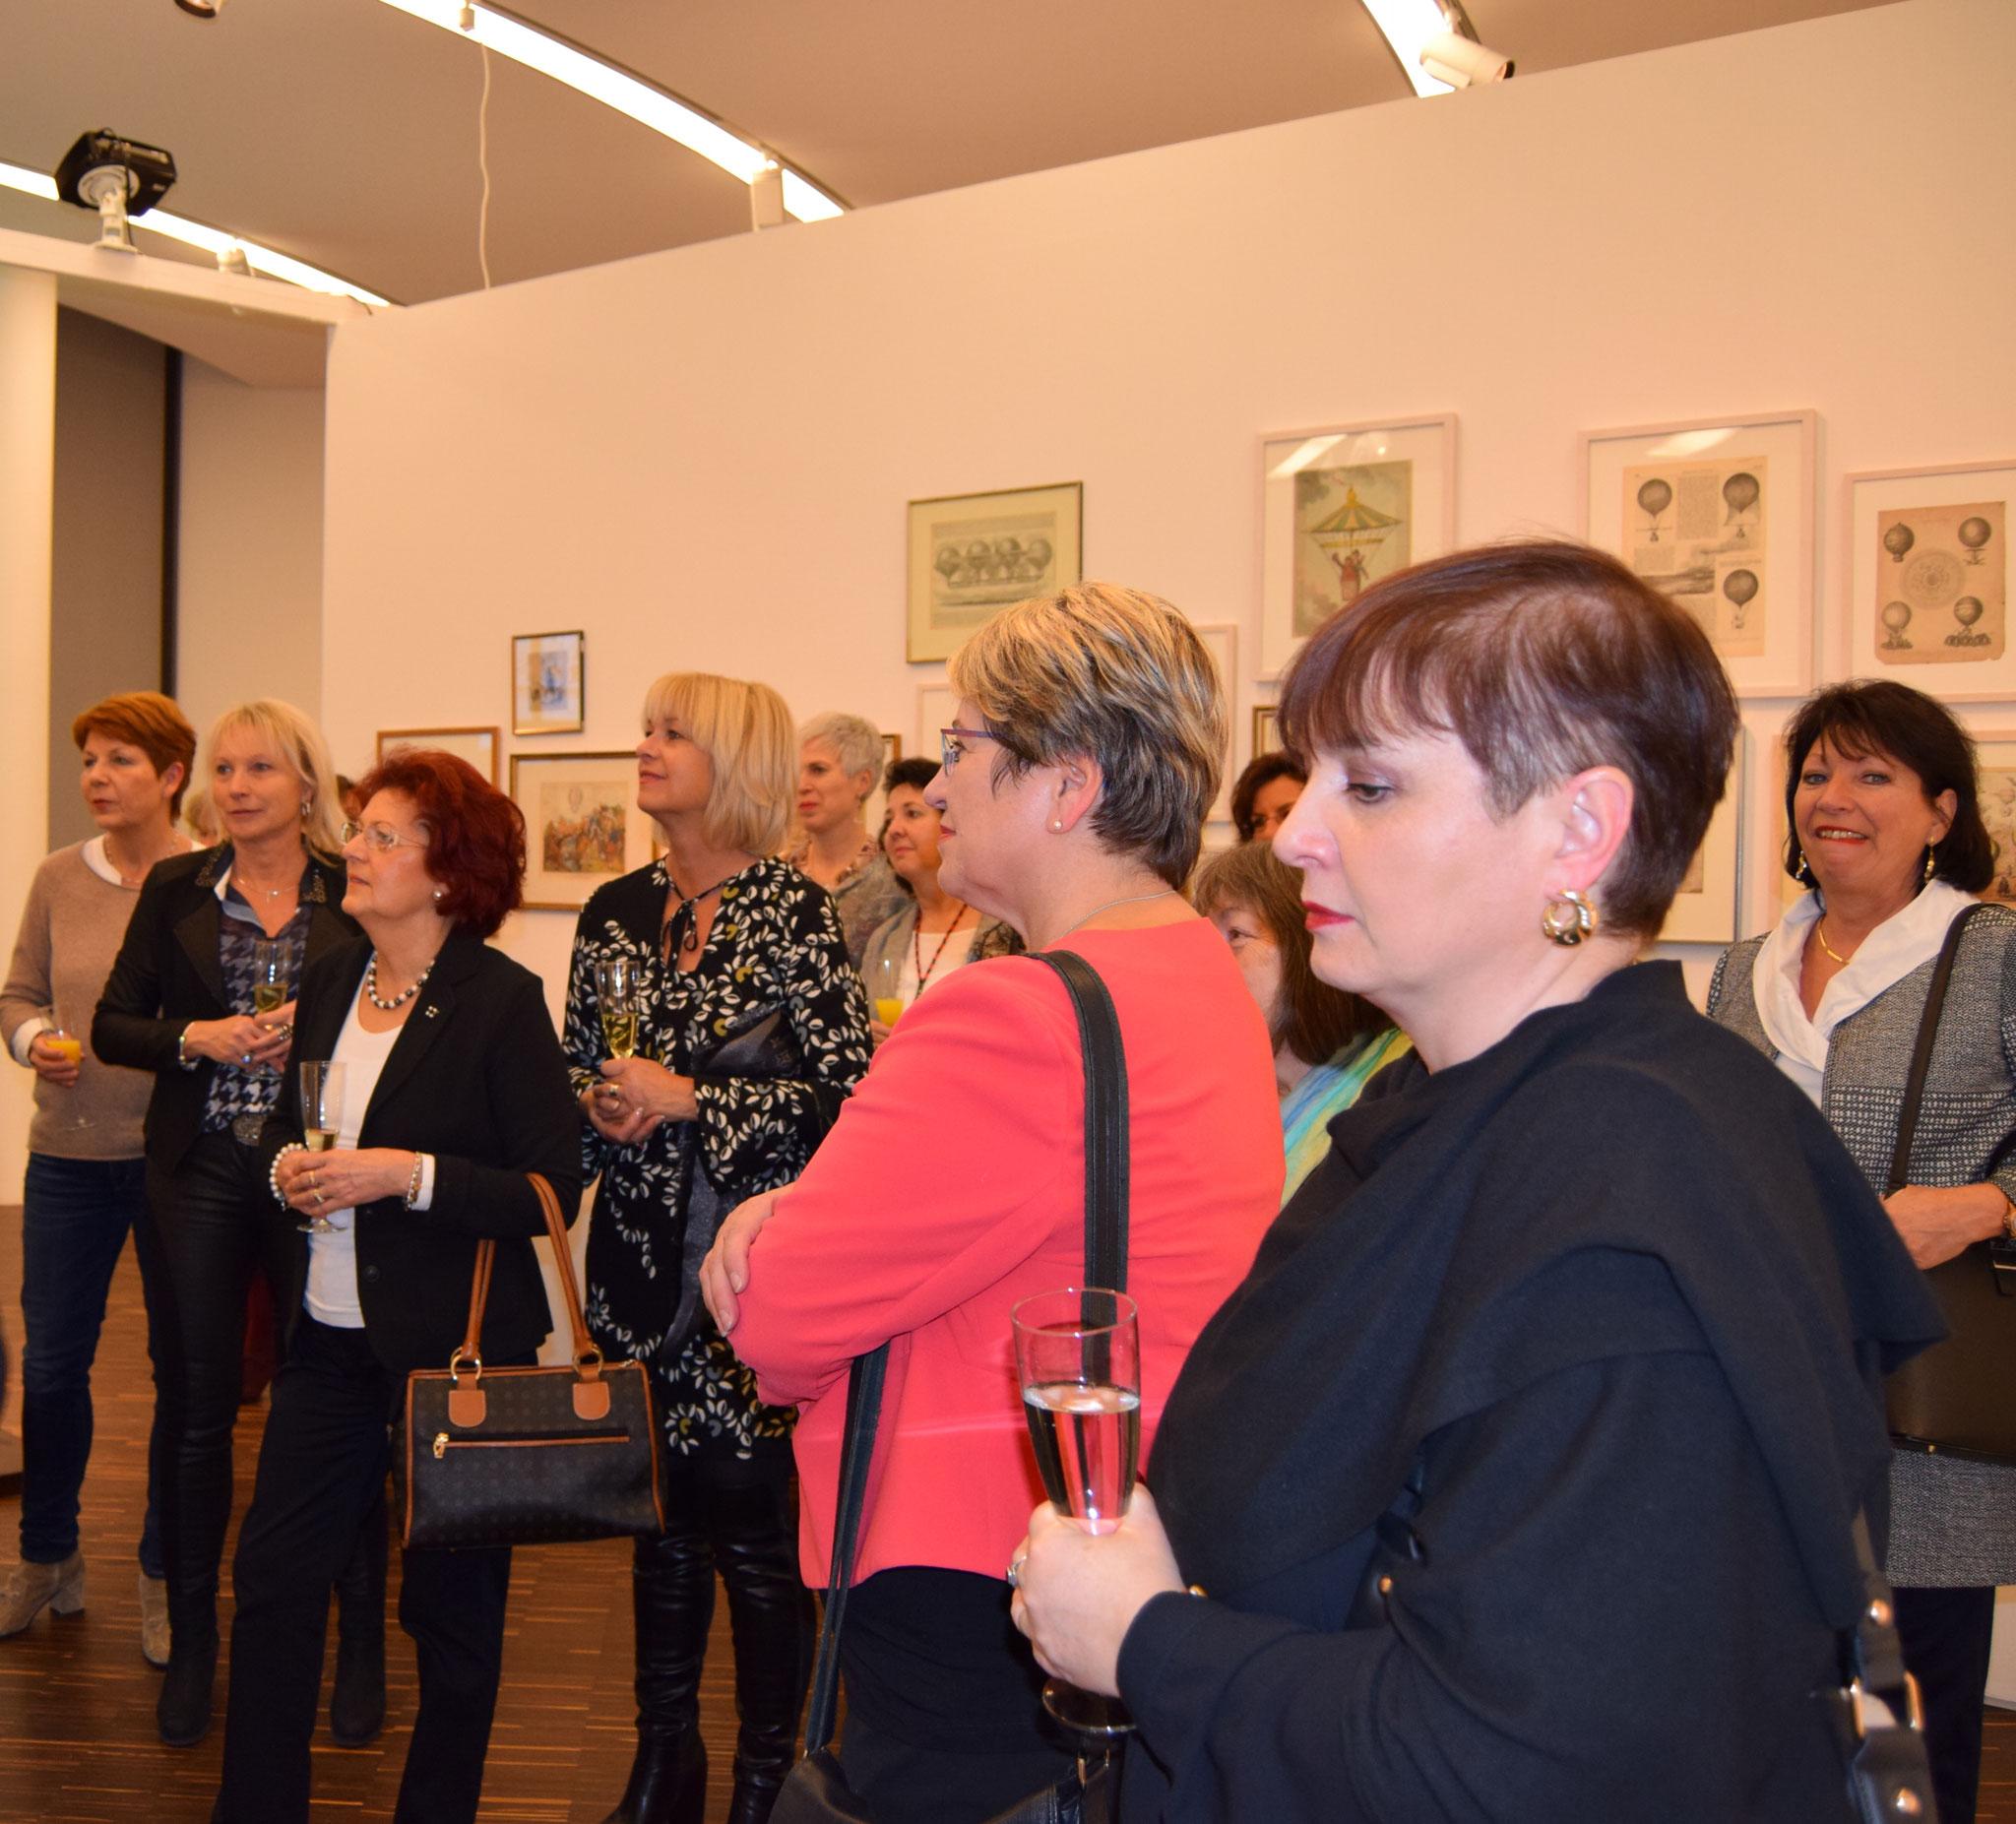 12-16 Empfang im Museum LA8 in Baden-Baden